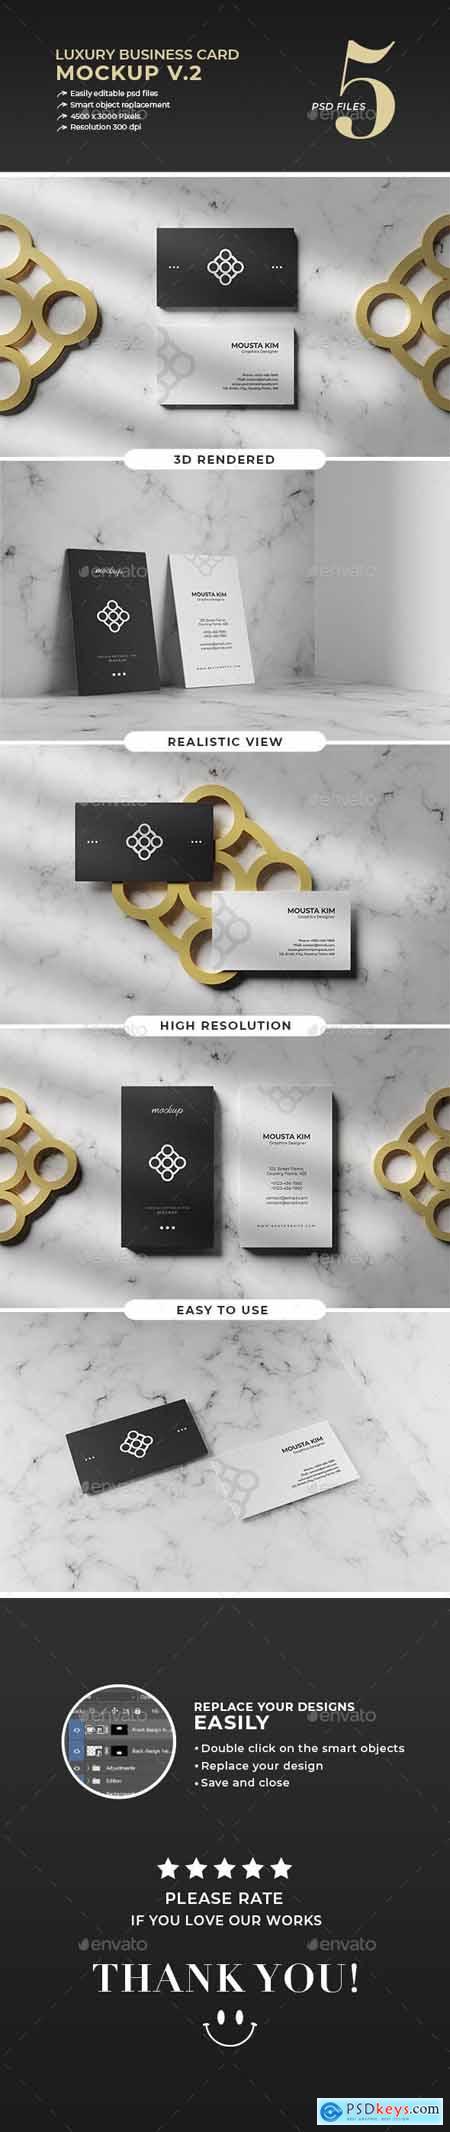 Luxury business card mockup v.2 30097283